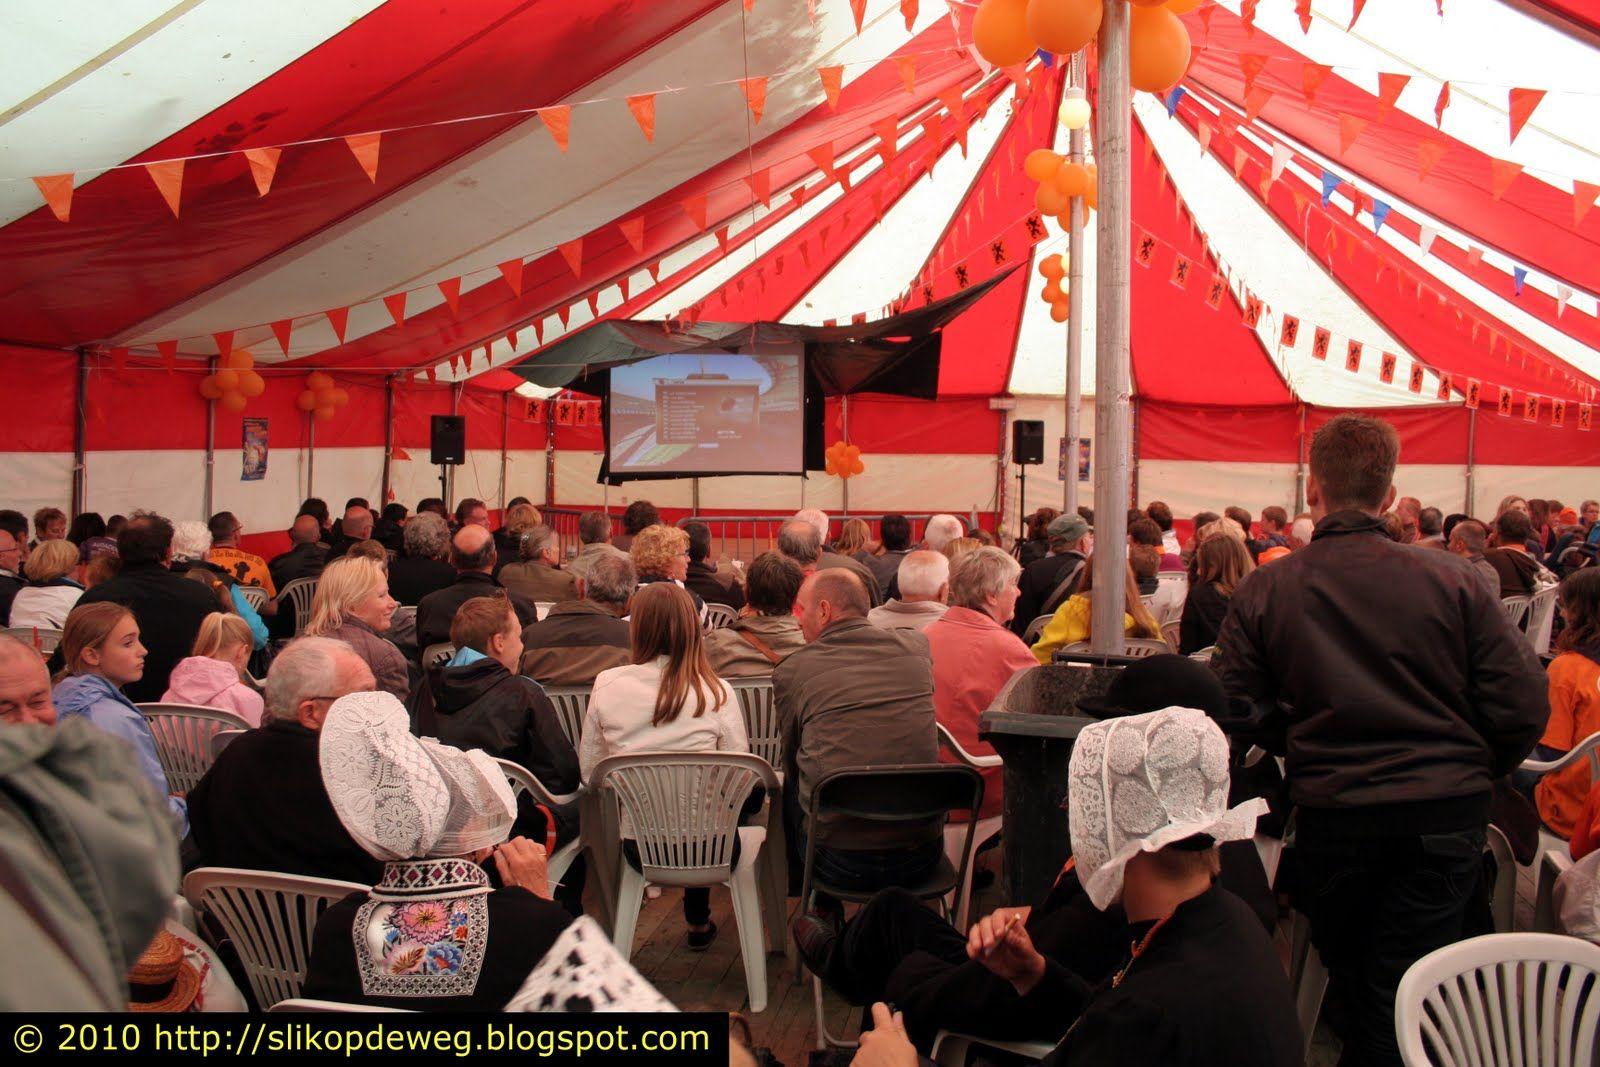 SlikopdeWeg: WK-Mania  Volendam en Cadzand #Cadzand #Volendam